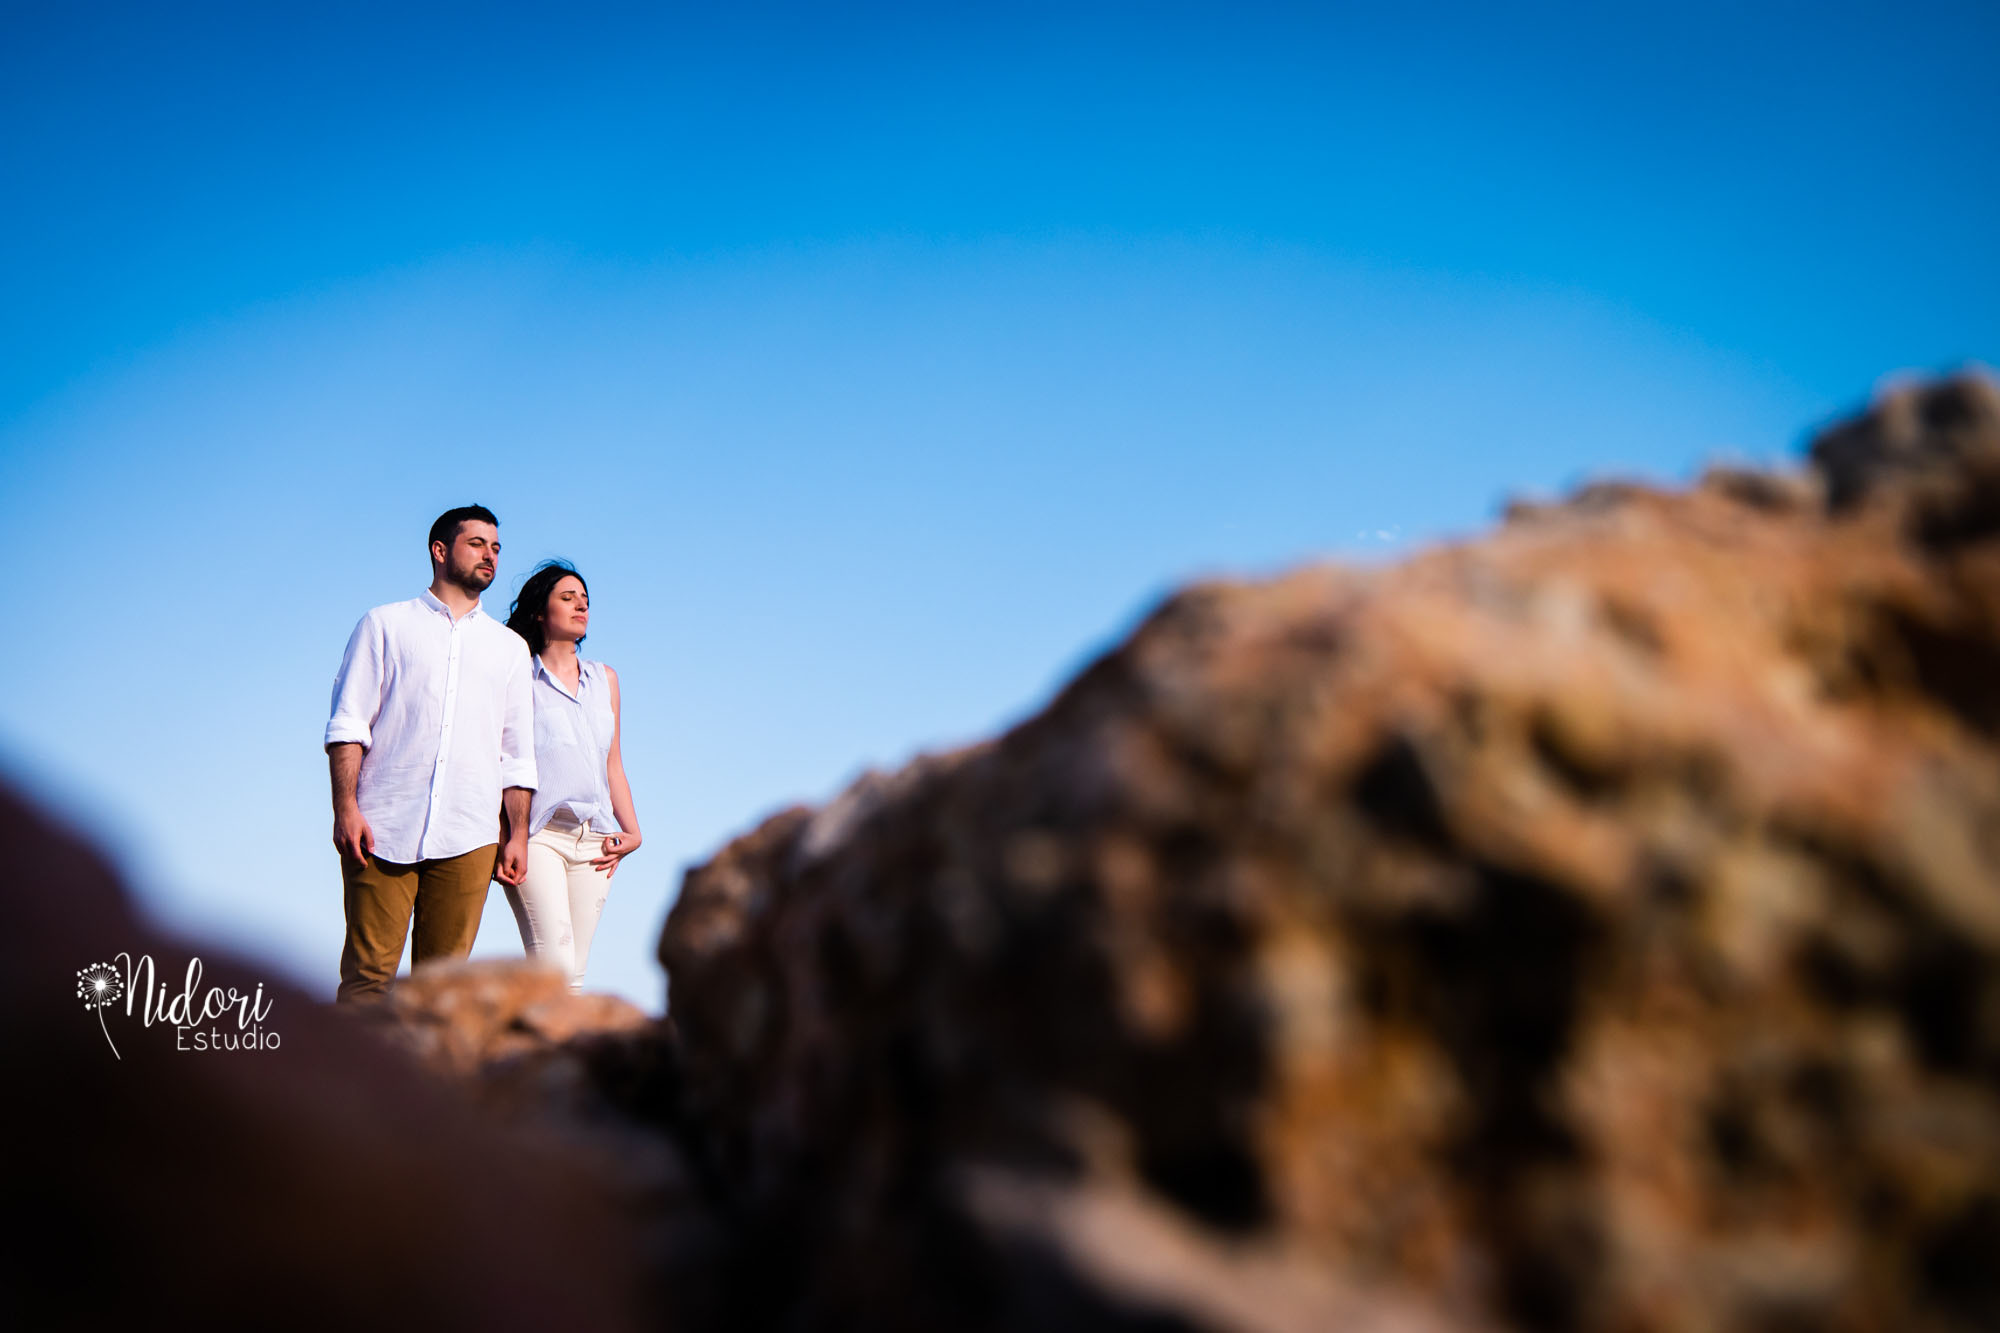 fotos-de-boda-reportaje-novios-fotografia-boda-nidoriestudio-fotos-valencia-almazora-castellon-españa-spain-001